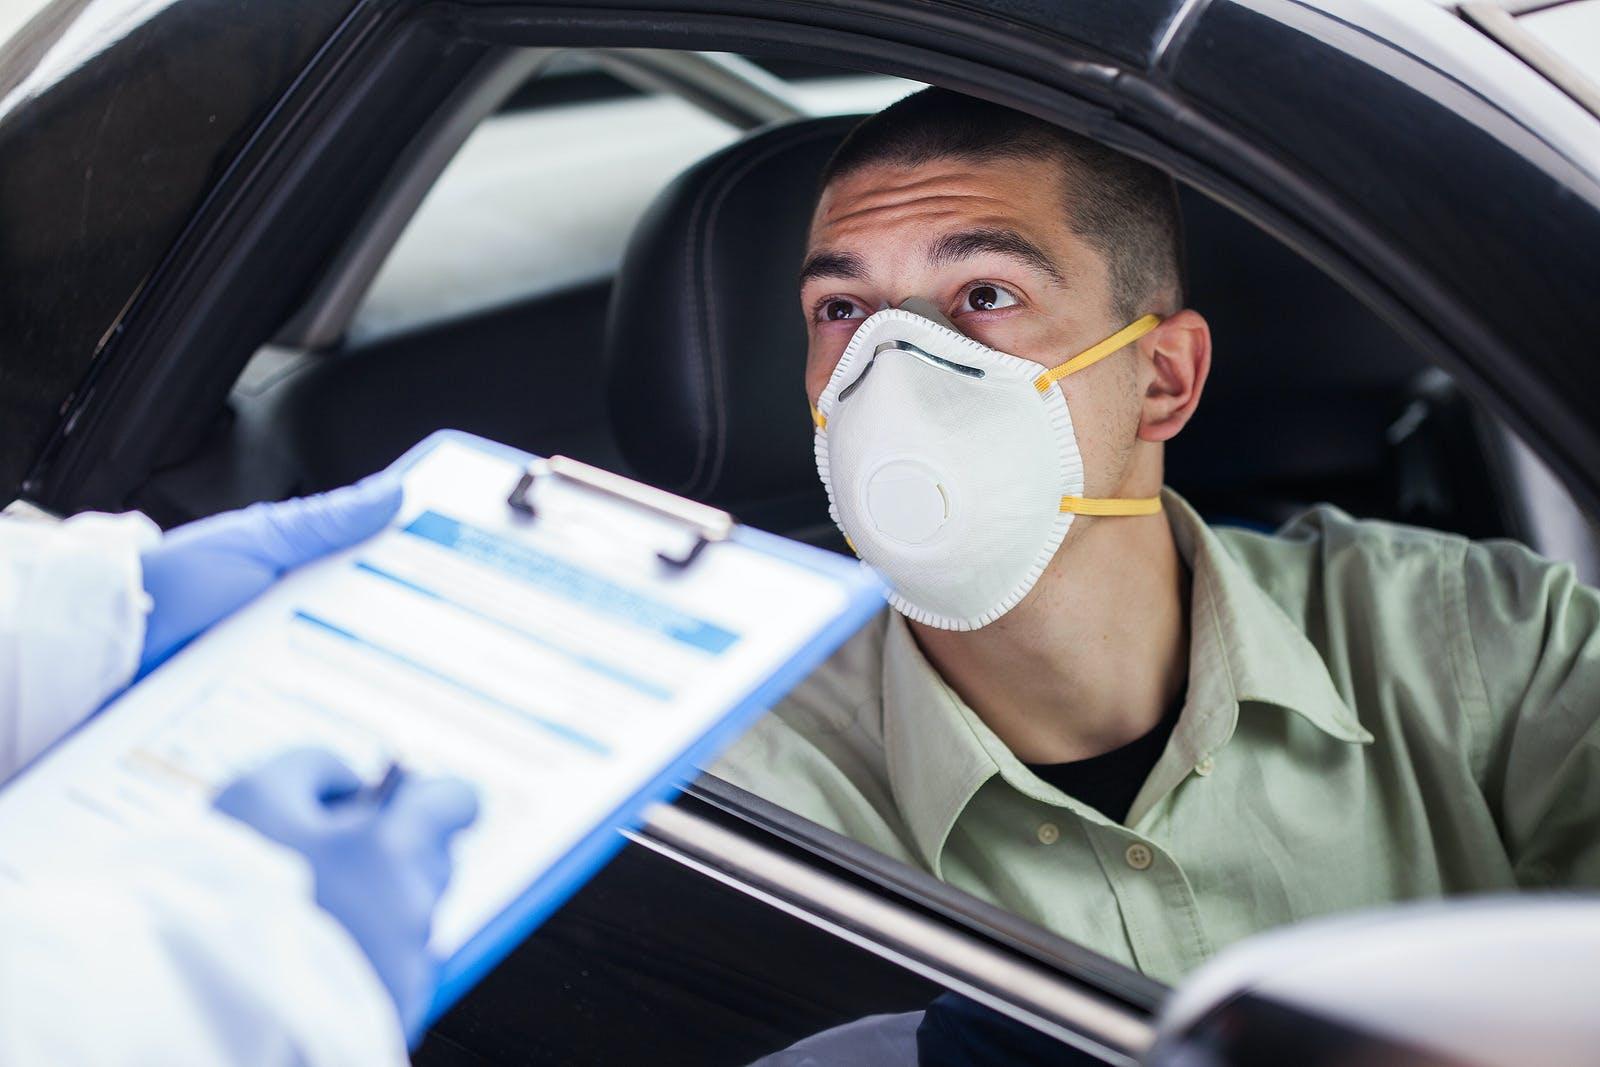 man in a car wearing an N-95 mask